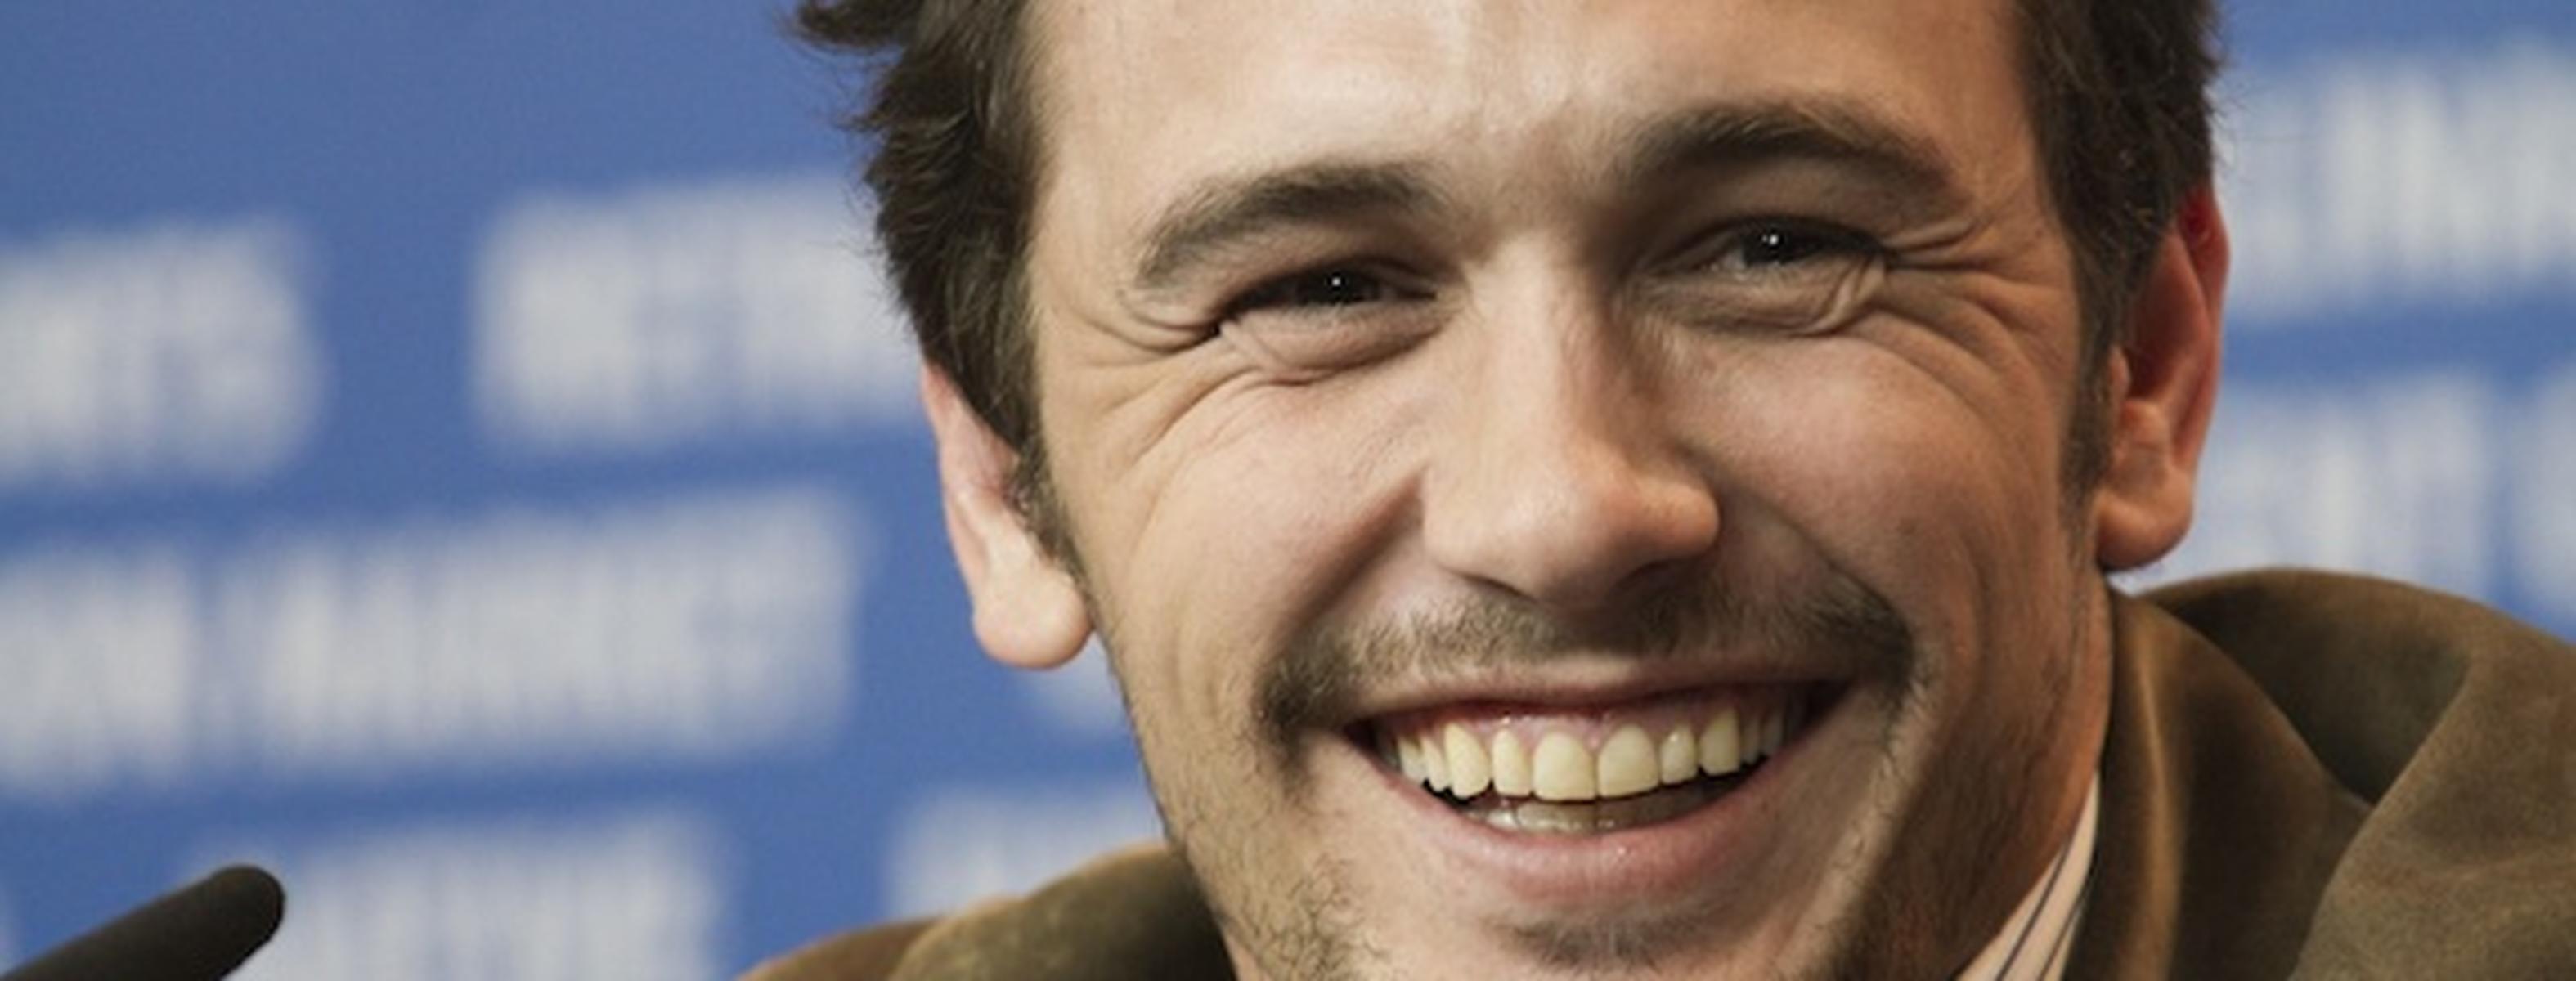 Franco casting